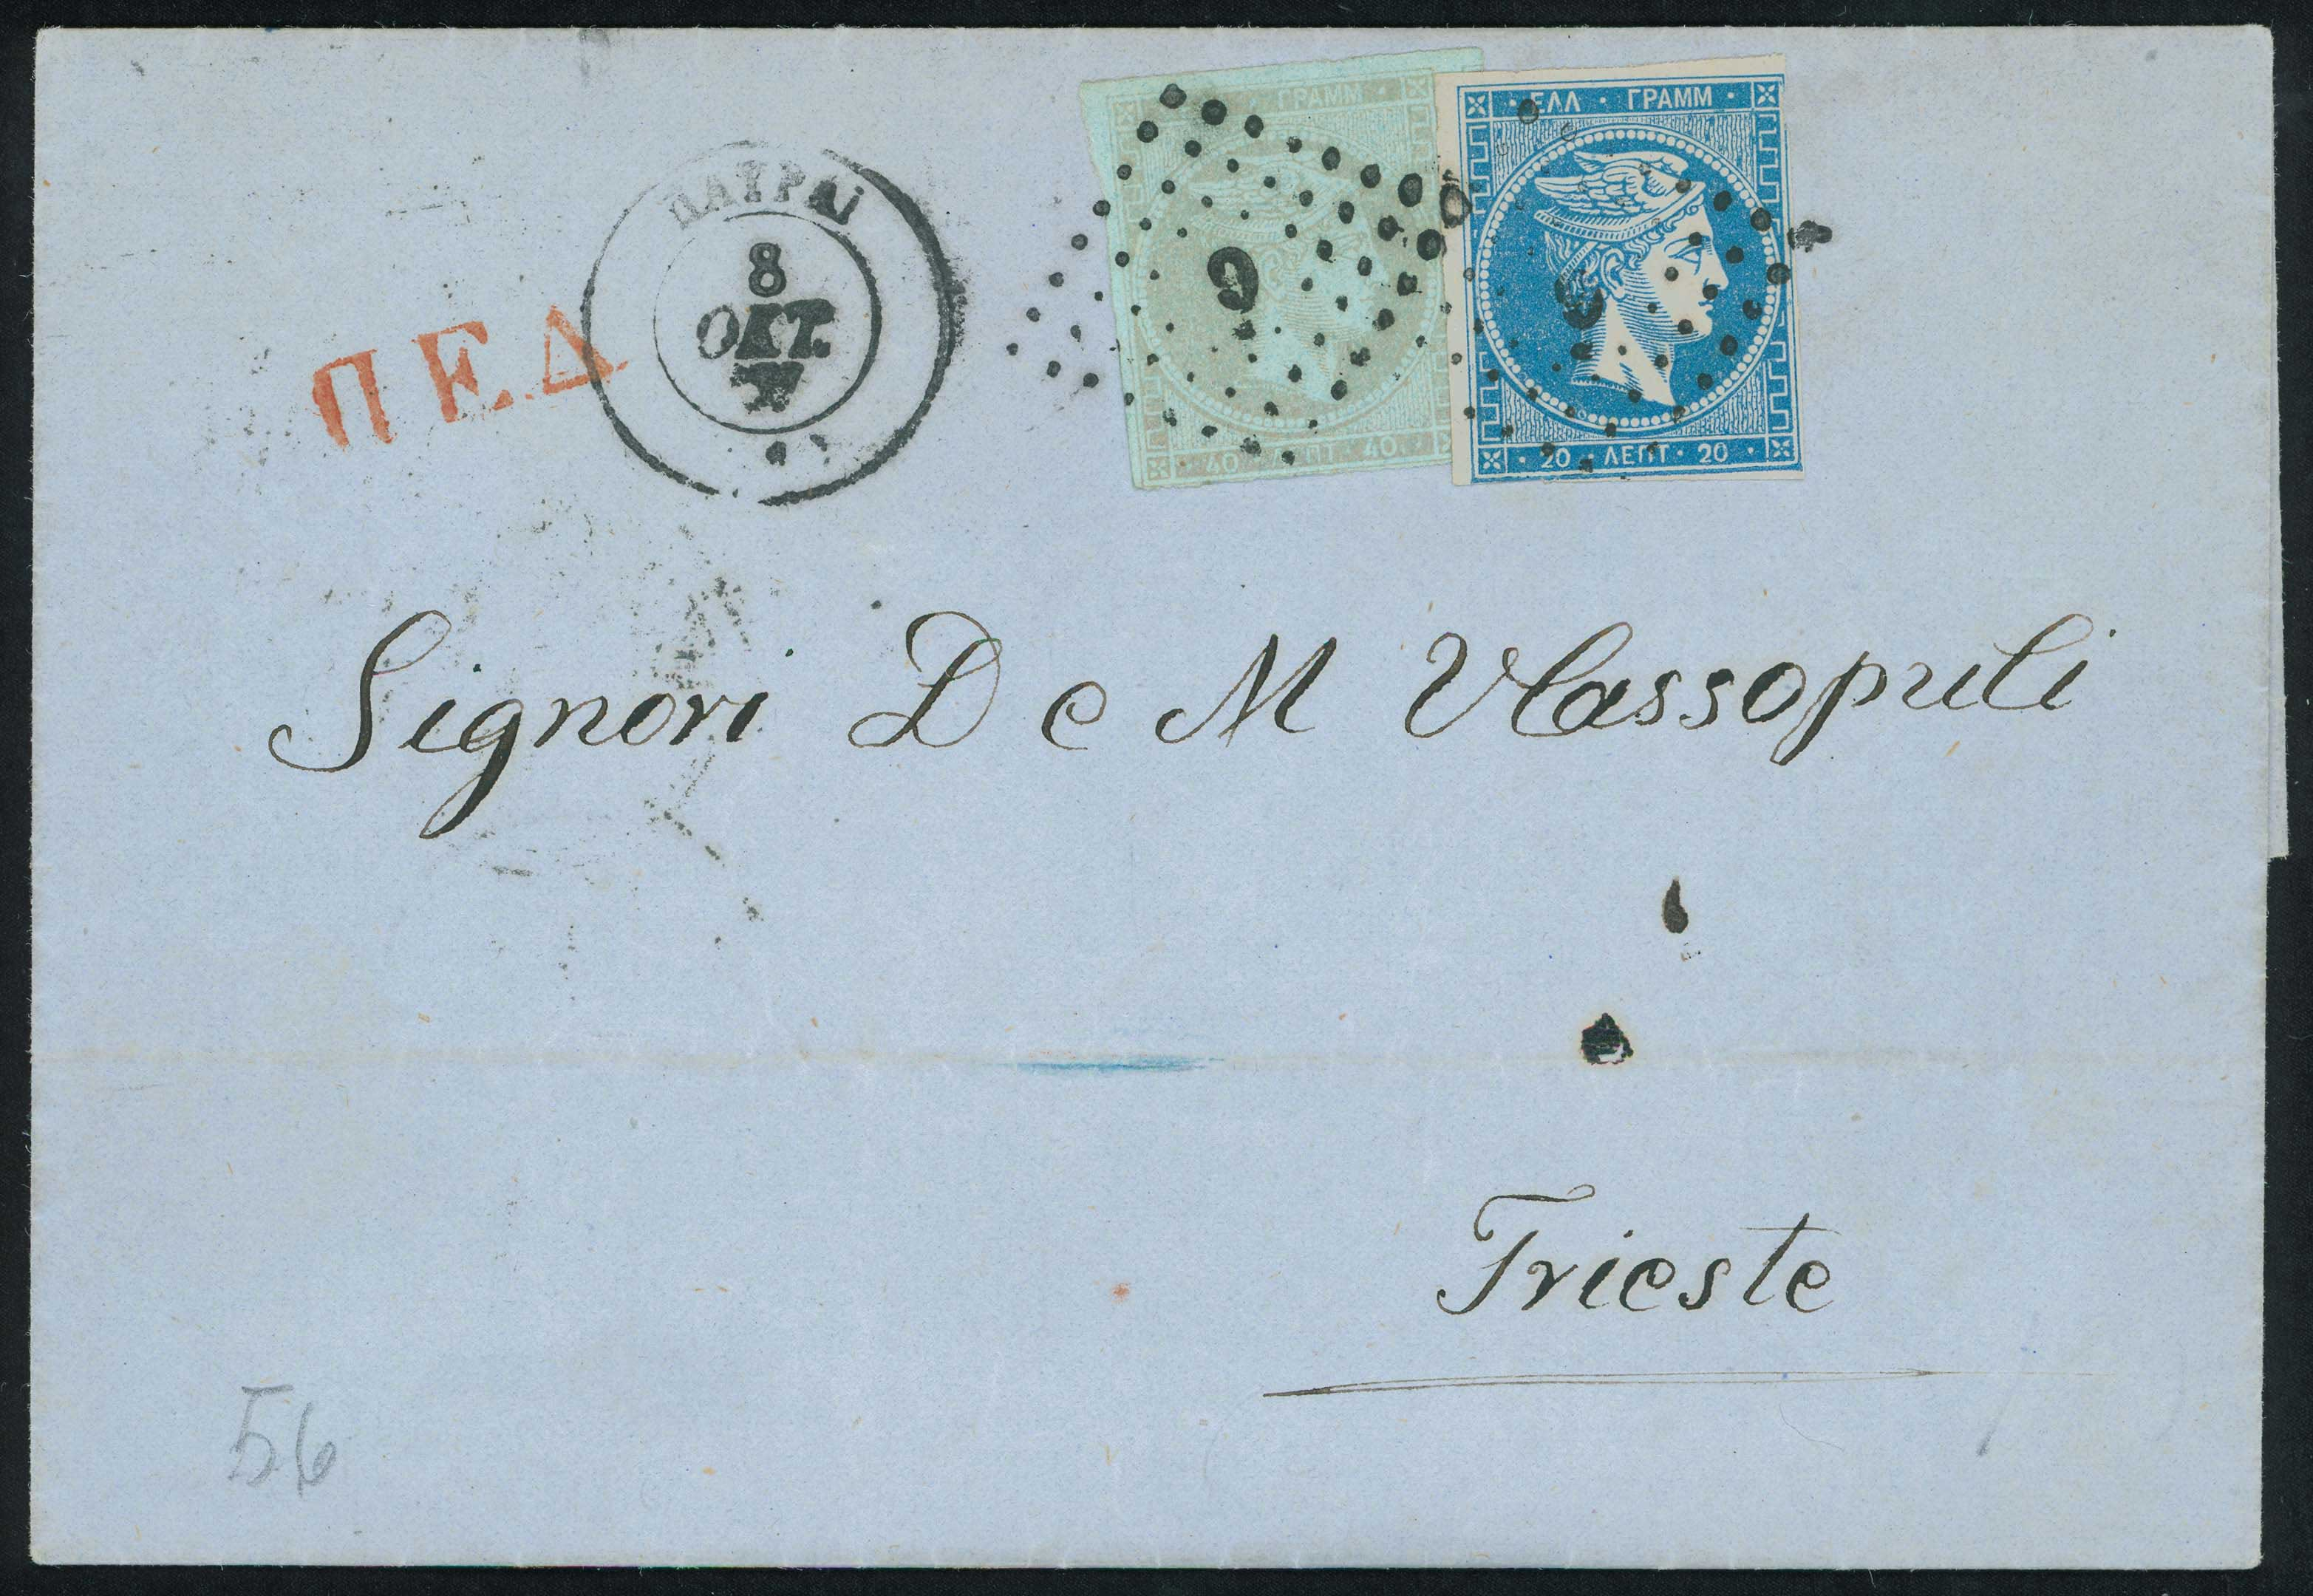 Lot 110 - -  LARGE HERMES HEAD 1862/67 consecutive athens printings -  A. Karamitsos Postal & Live Internet Auction 677